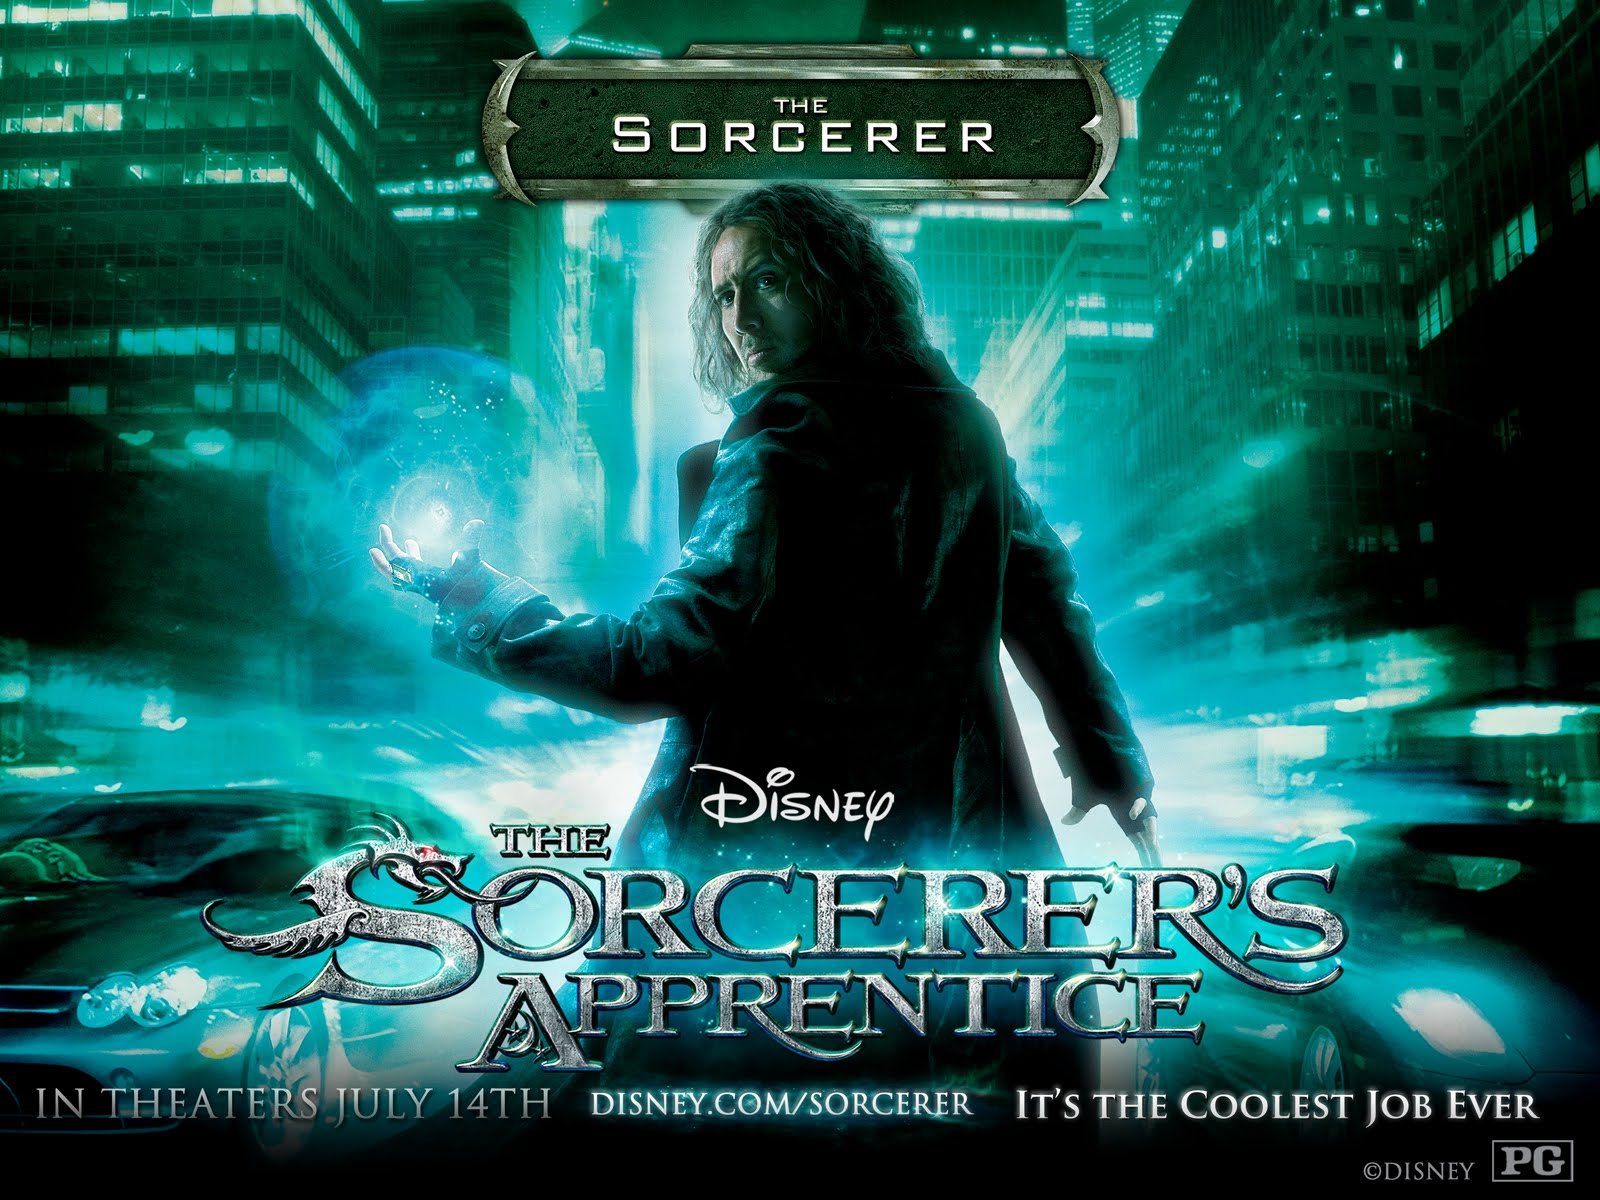 http://2.bp.blogspot.com/-5VZvm6v7pNI/TfkcGIE88GI/AAAAAAAAFt8/JVhpqEo_lx8/s1600/The_Sorcerers_Apprentice_Wallpaper.jpg